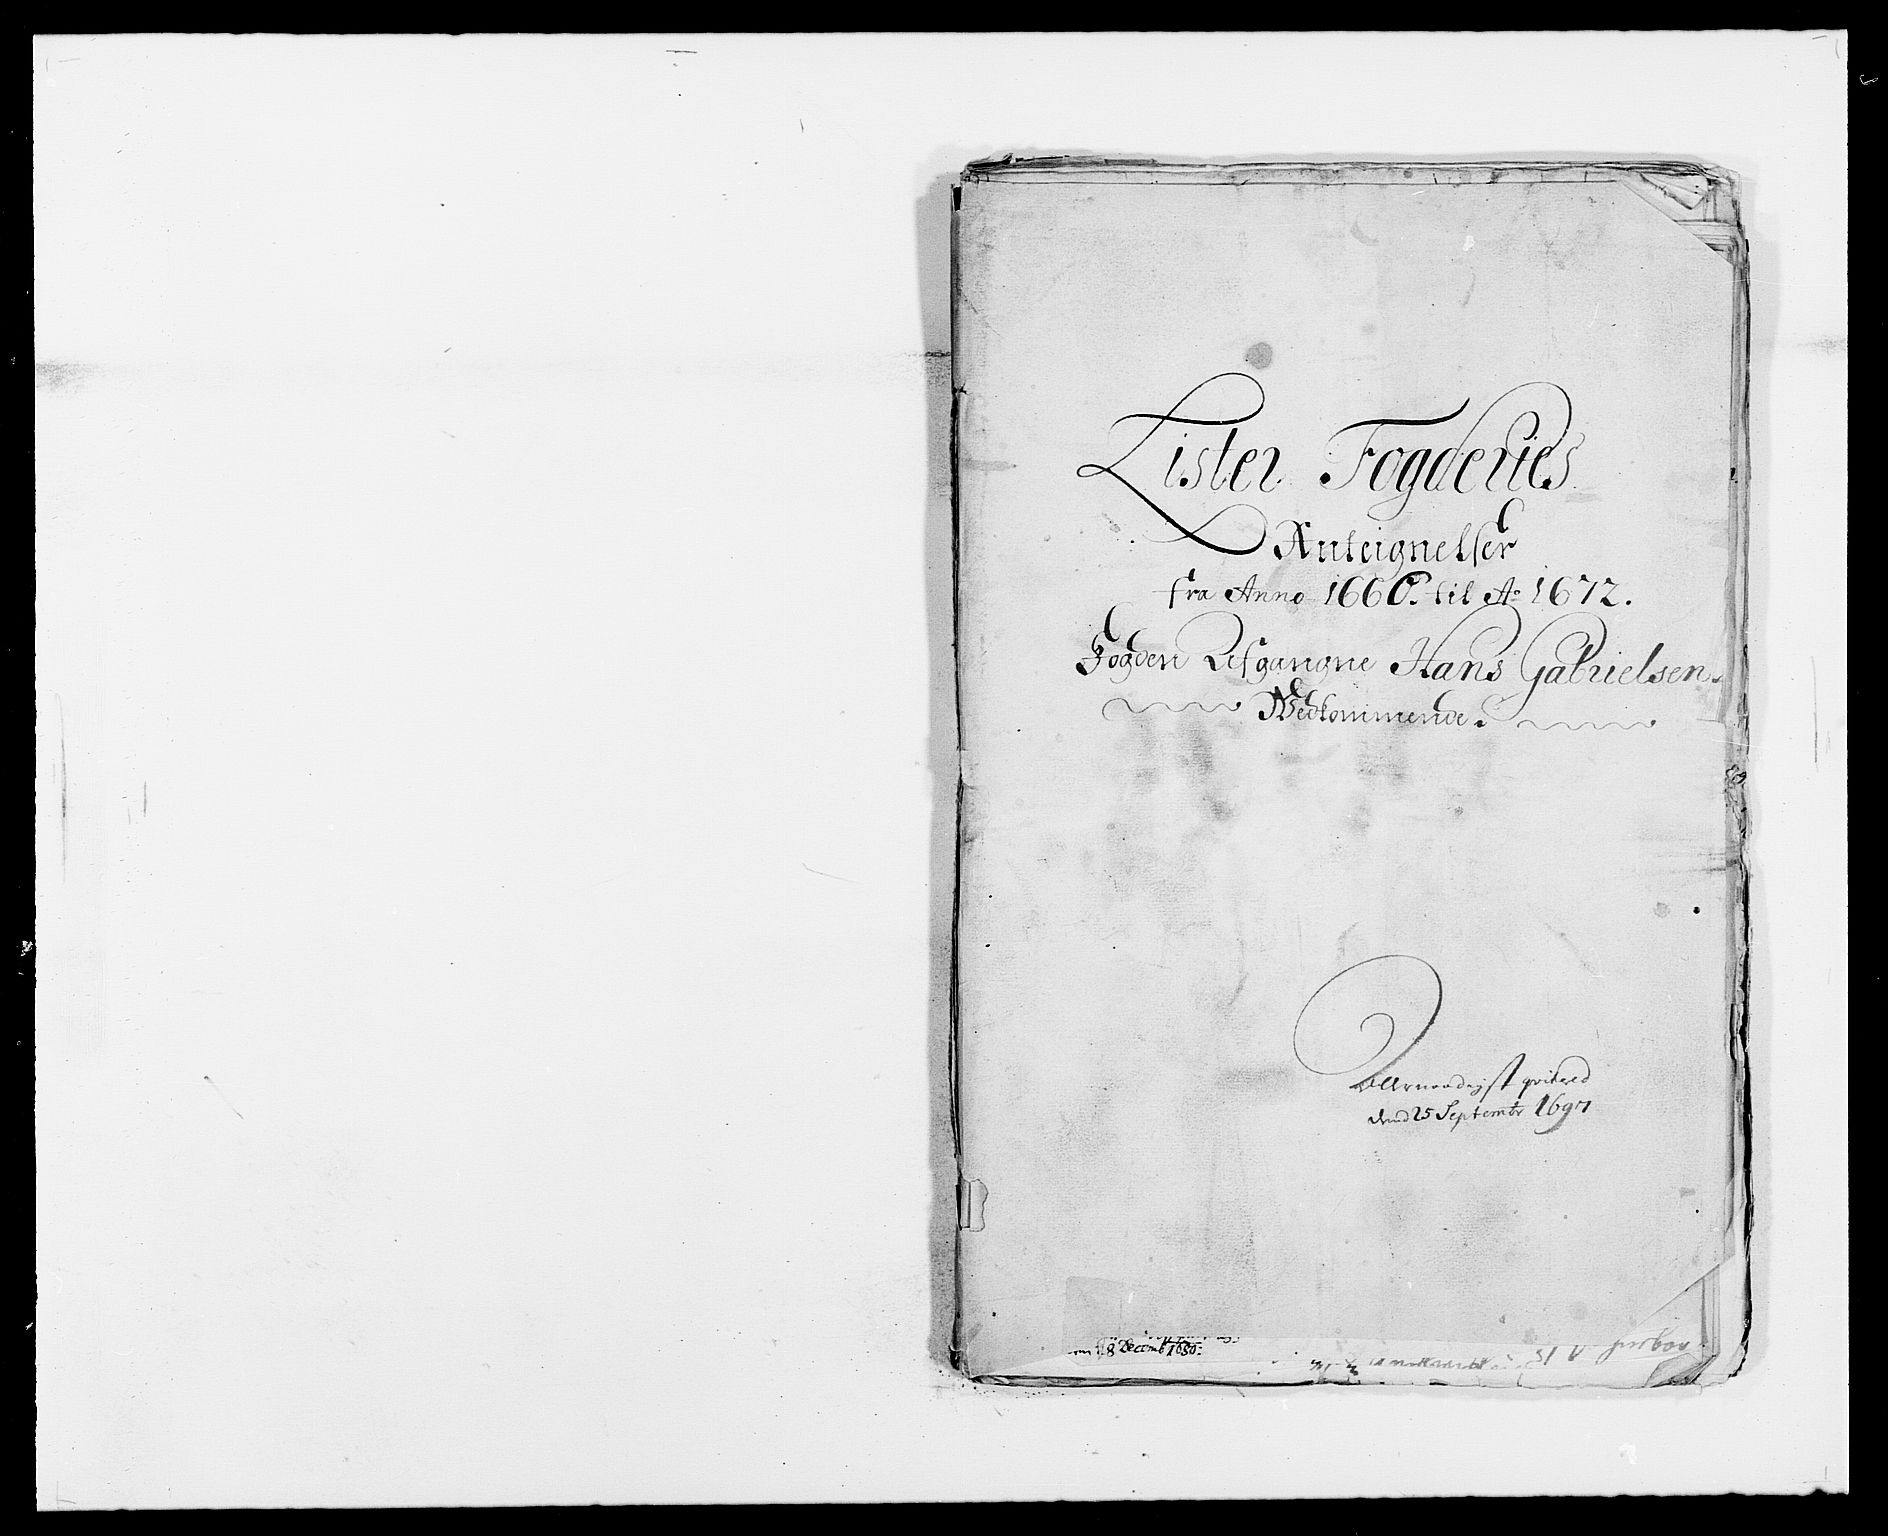 RA, Rentekammeret inntil 1814, Reviderte regnskaper, Fogderegnskap, R41/L2526: Fogderegnskap Lista, 1672, s. 183